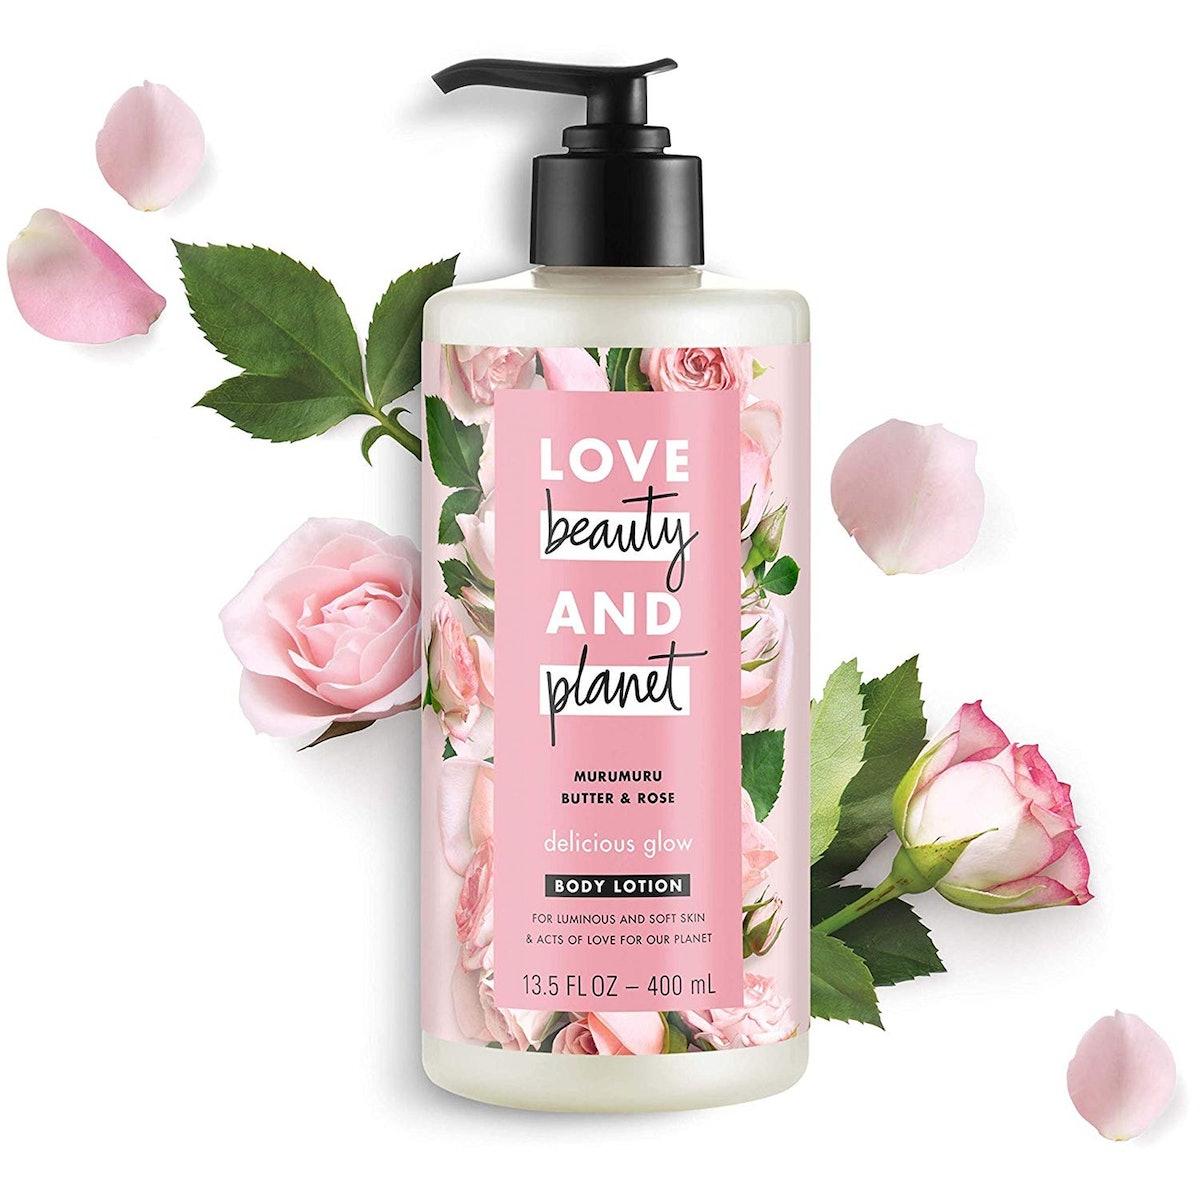 Love Beauty And Planet Murumuru Butter & Rose Body Lotion